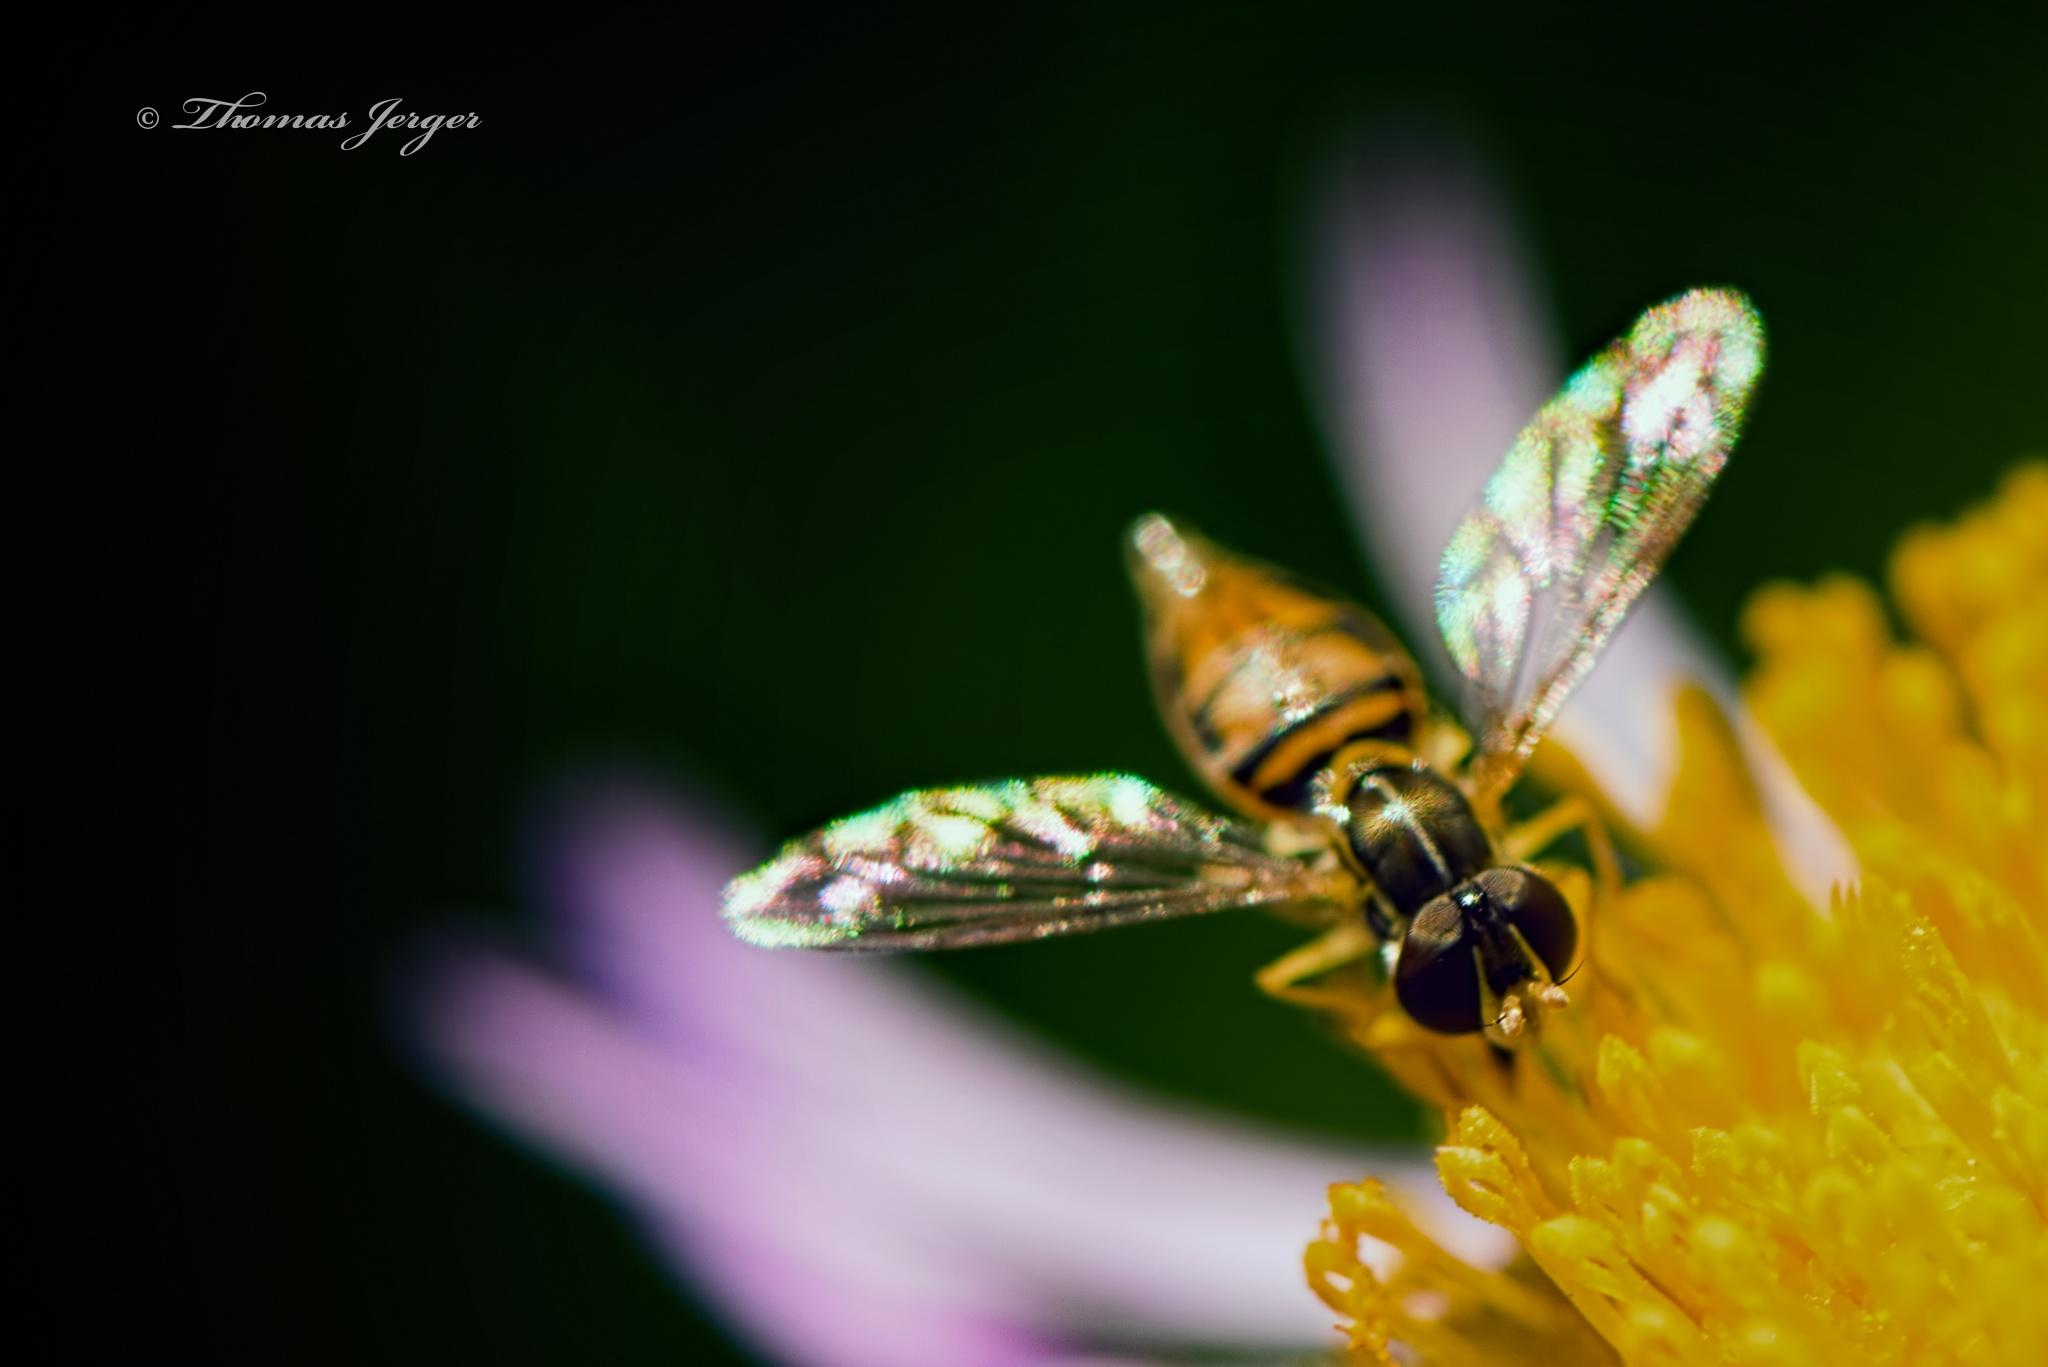 On Wings of Gossamer 0702 by ThomasJerger